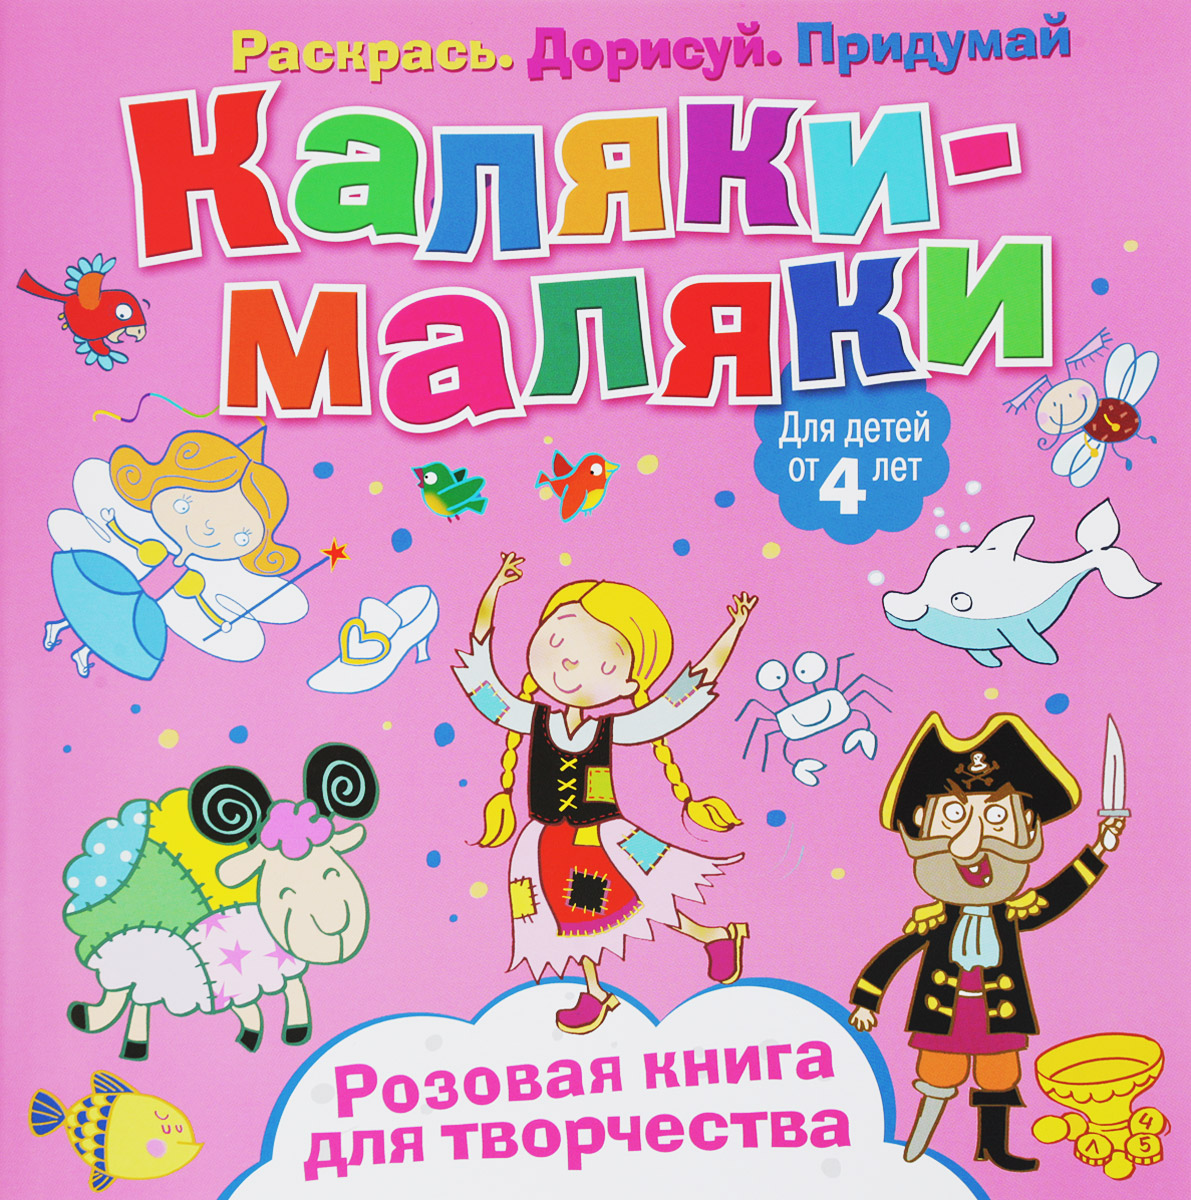 Каляки-маляки. Розовая книга для творчества